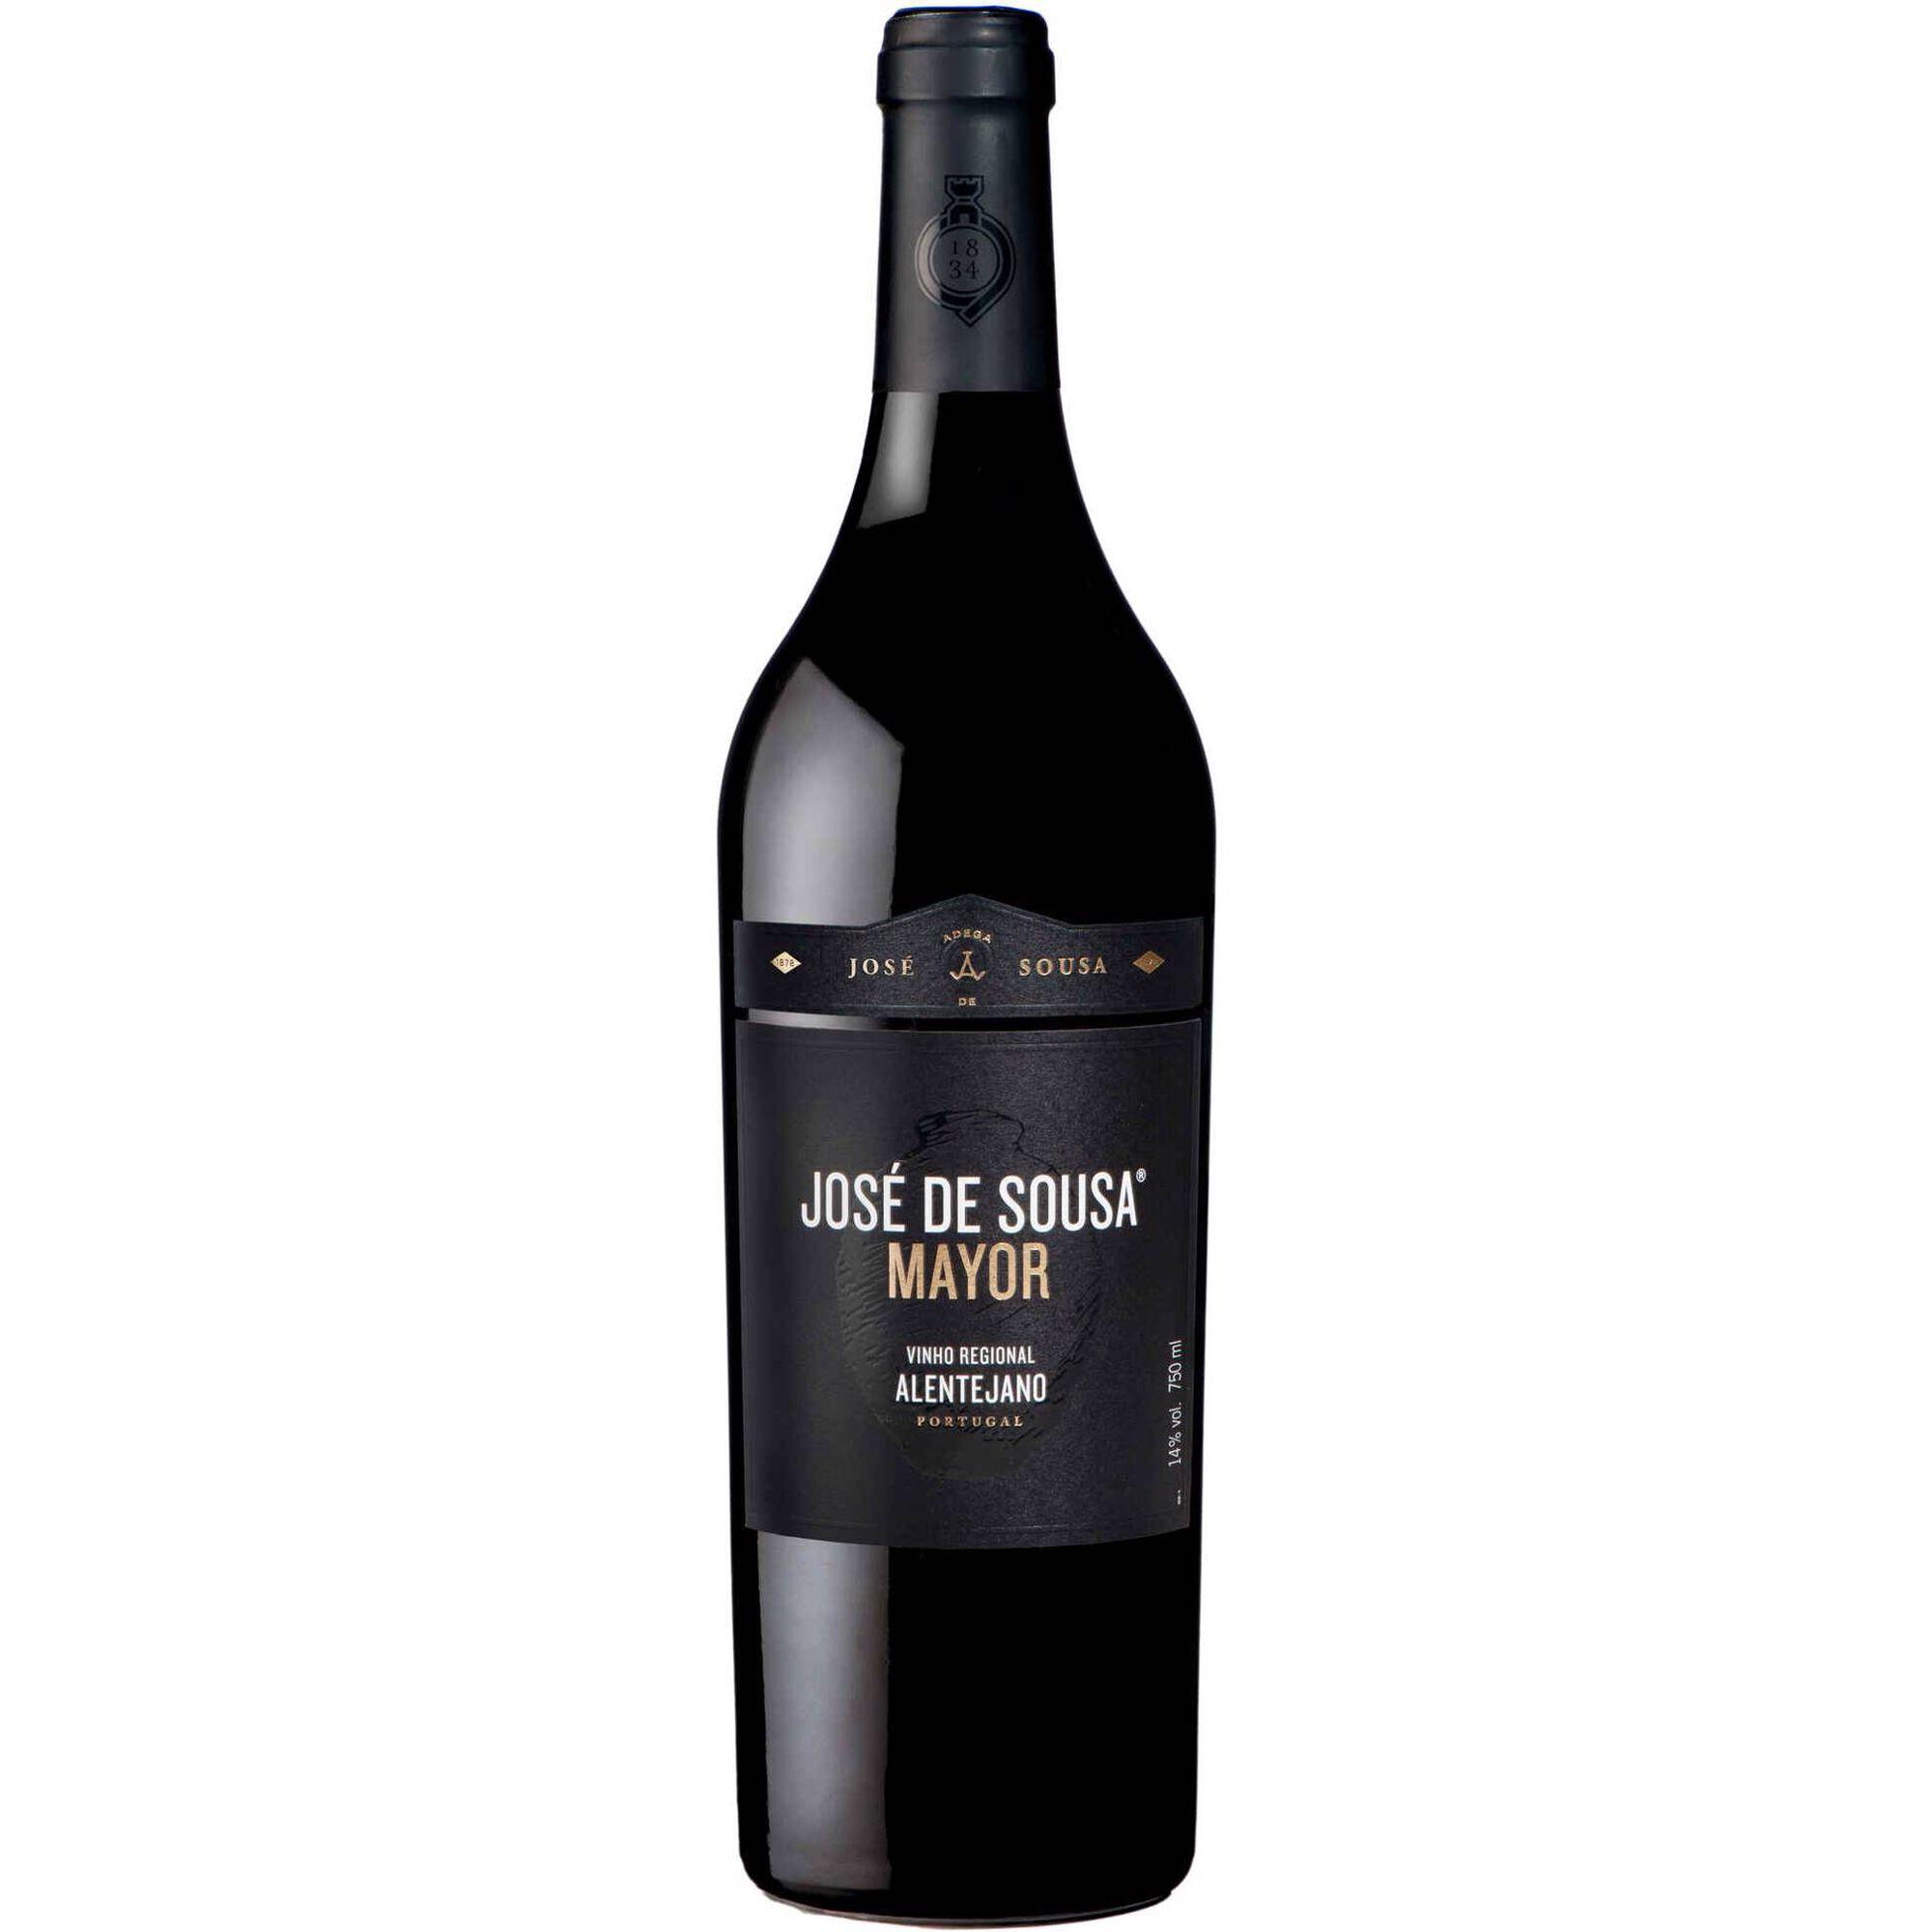 José de Sousa Mayor Regional Alentejano Vinho Tinto